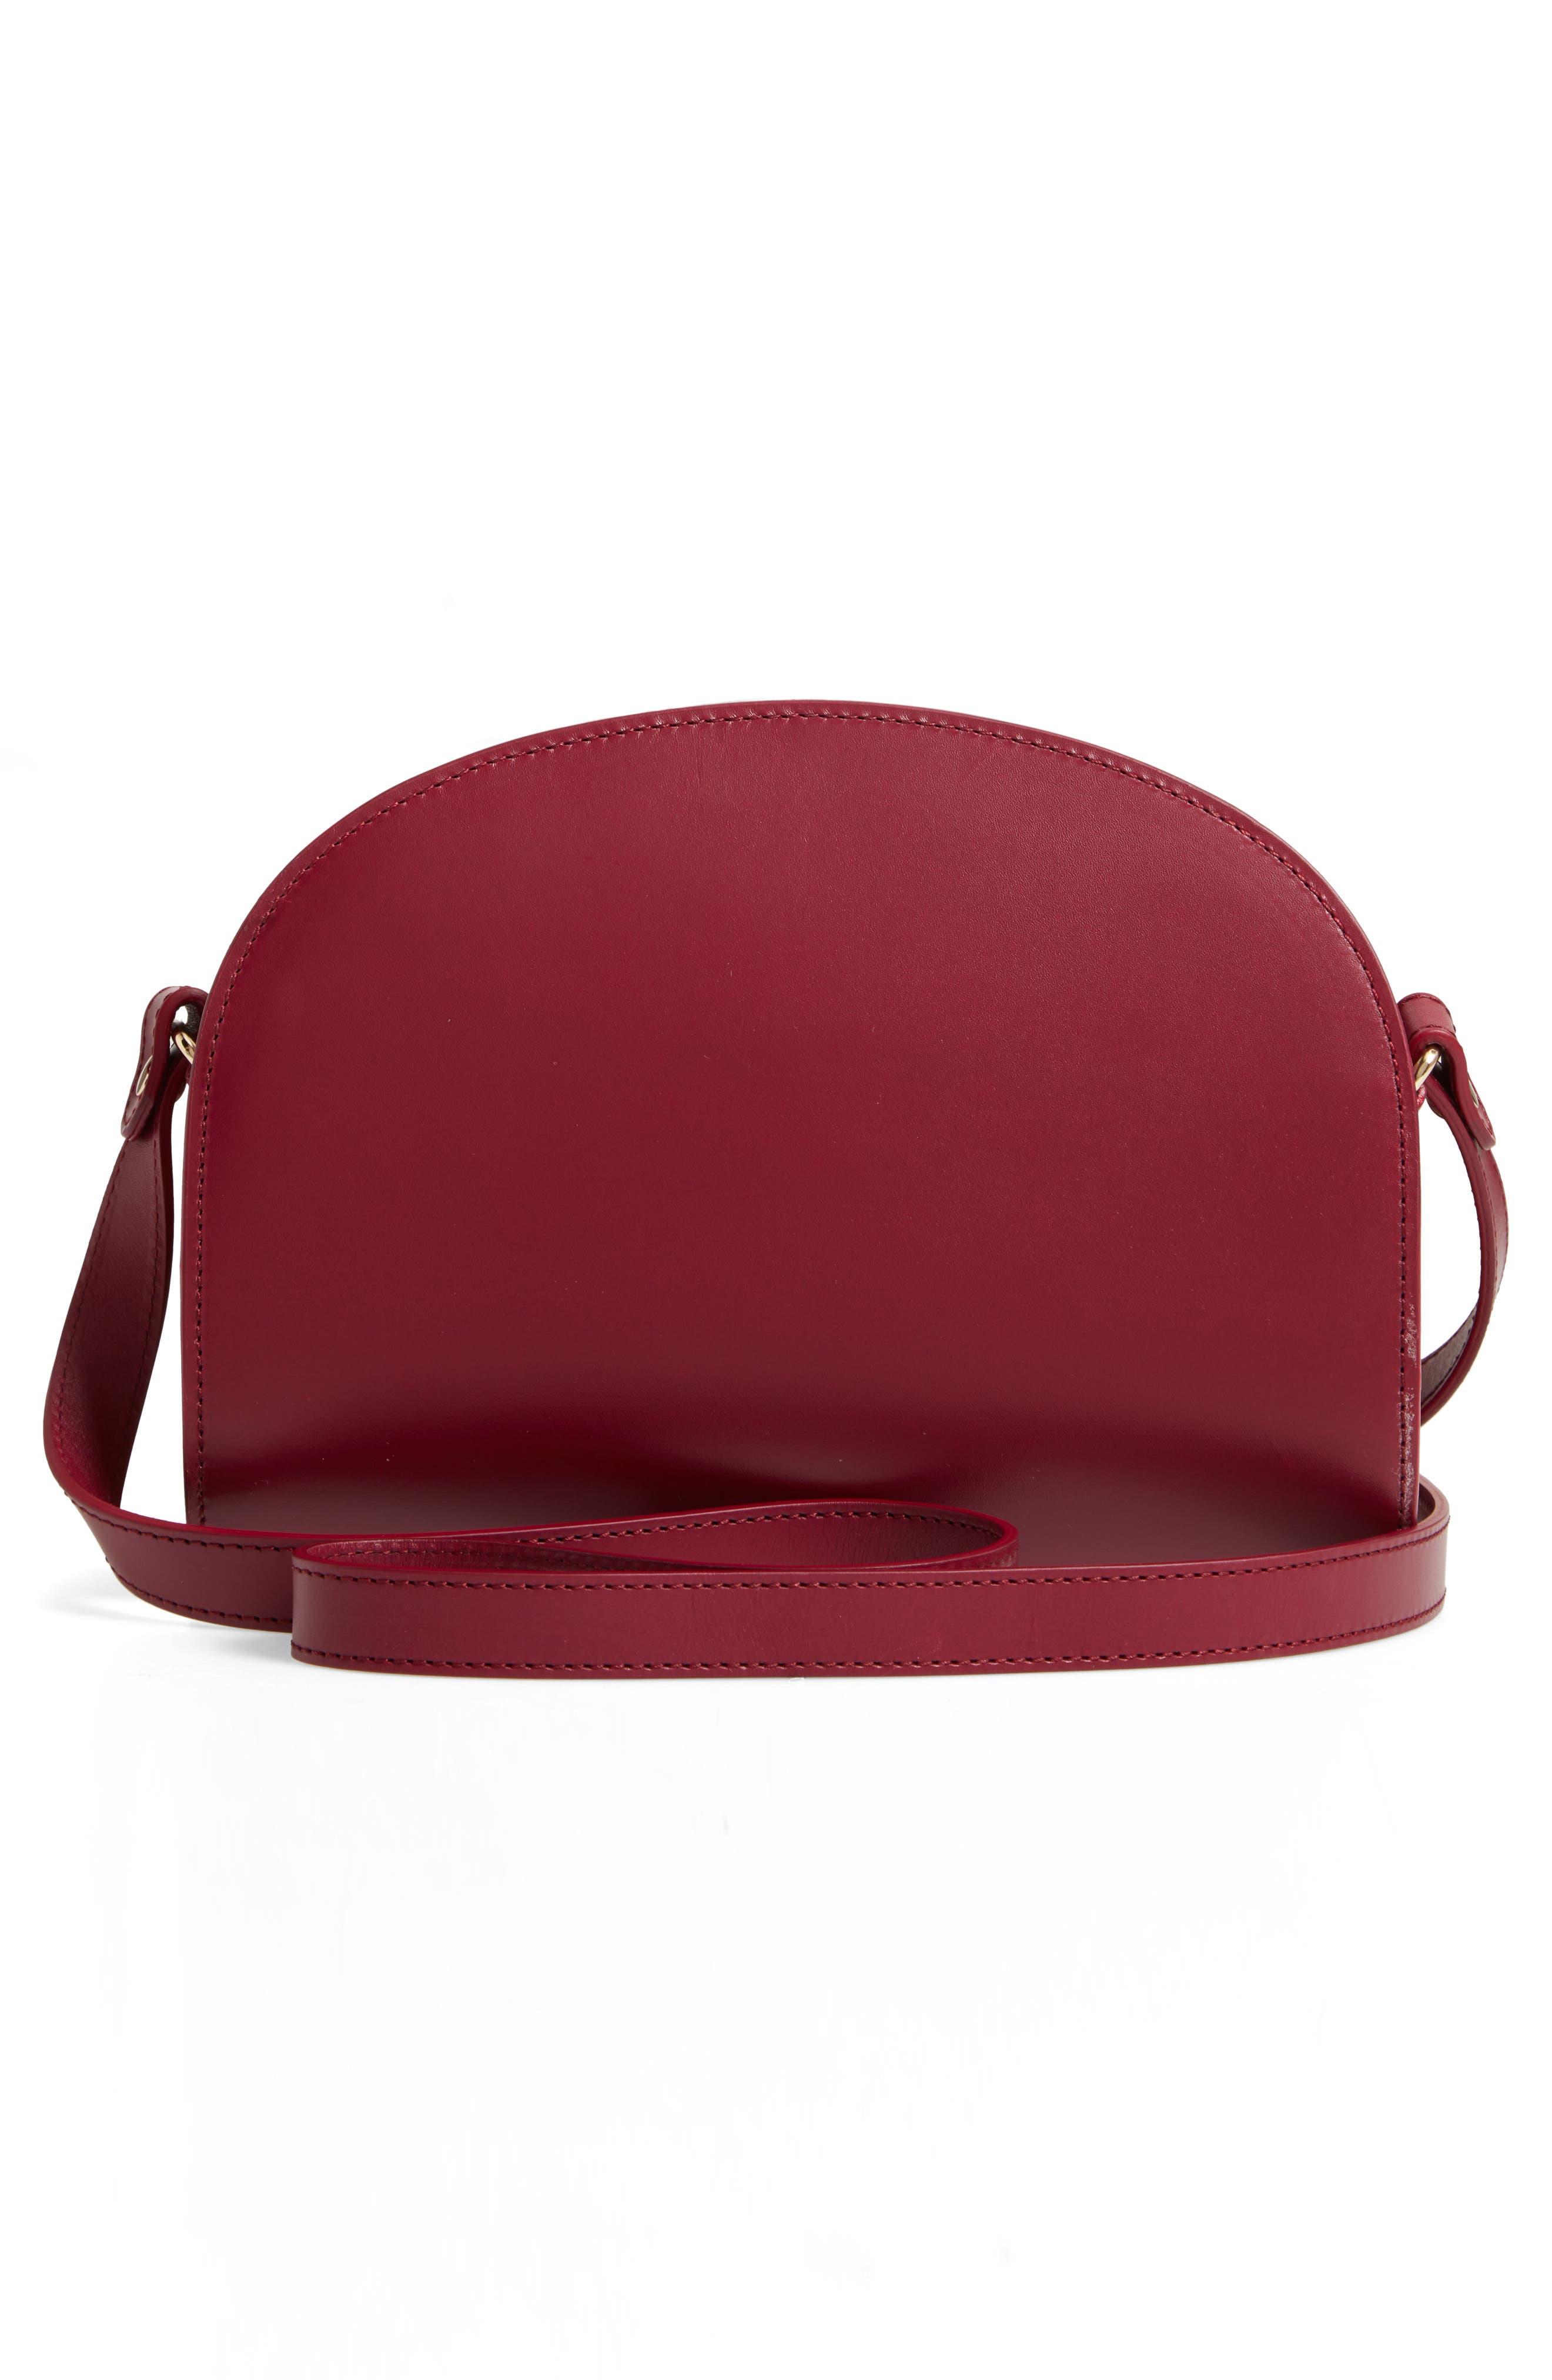 Sac Demi Lune Leather Crossbody Bag,                             Alternate thumbnail 3, color,                             FRAMBOISE